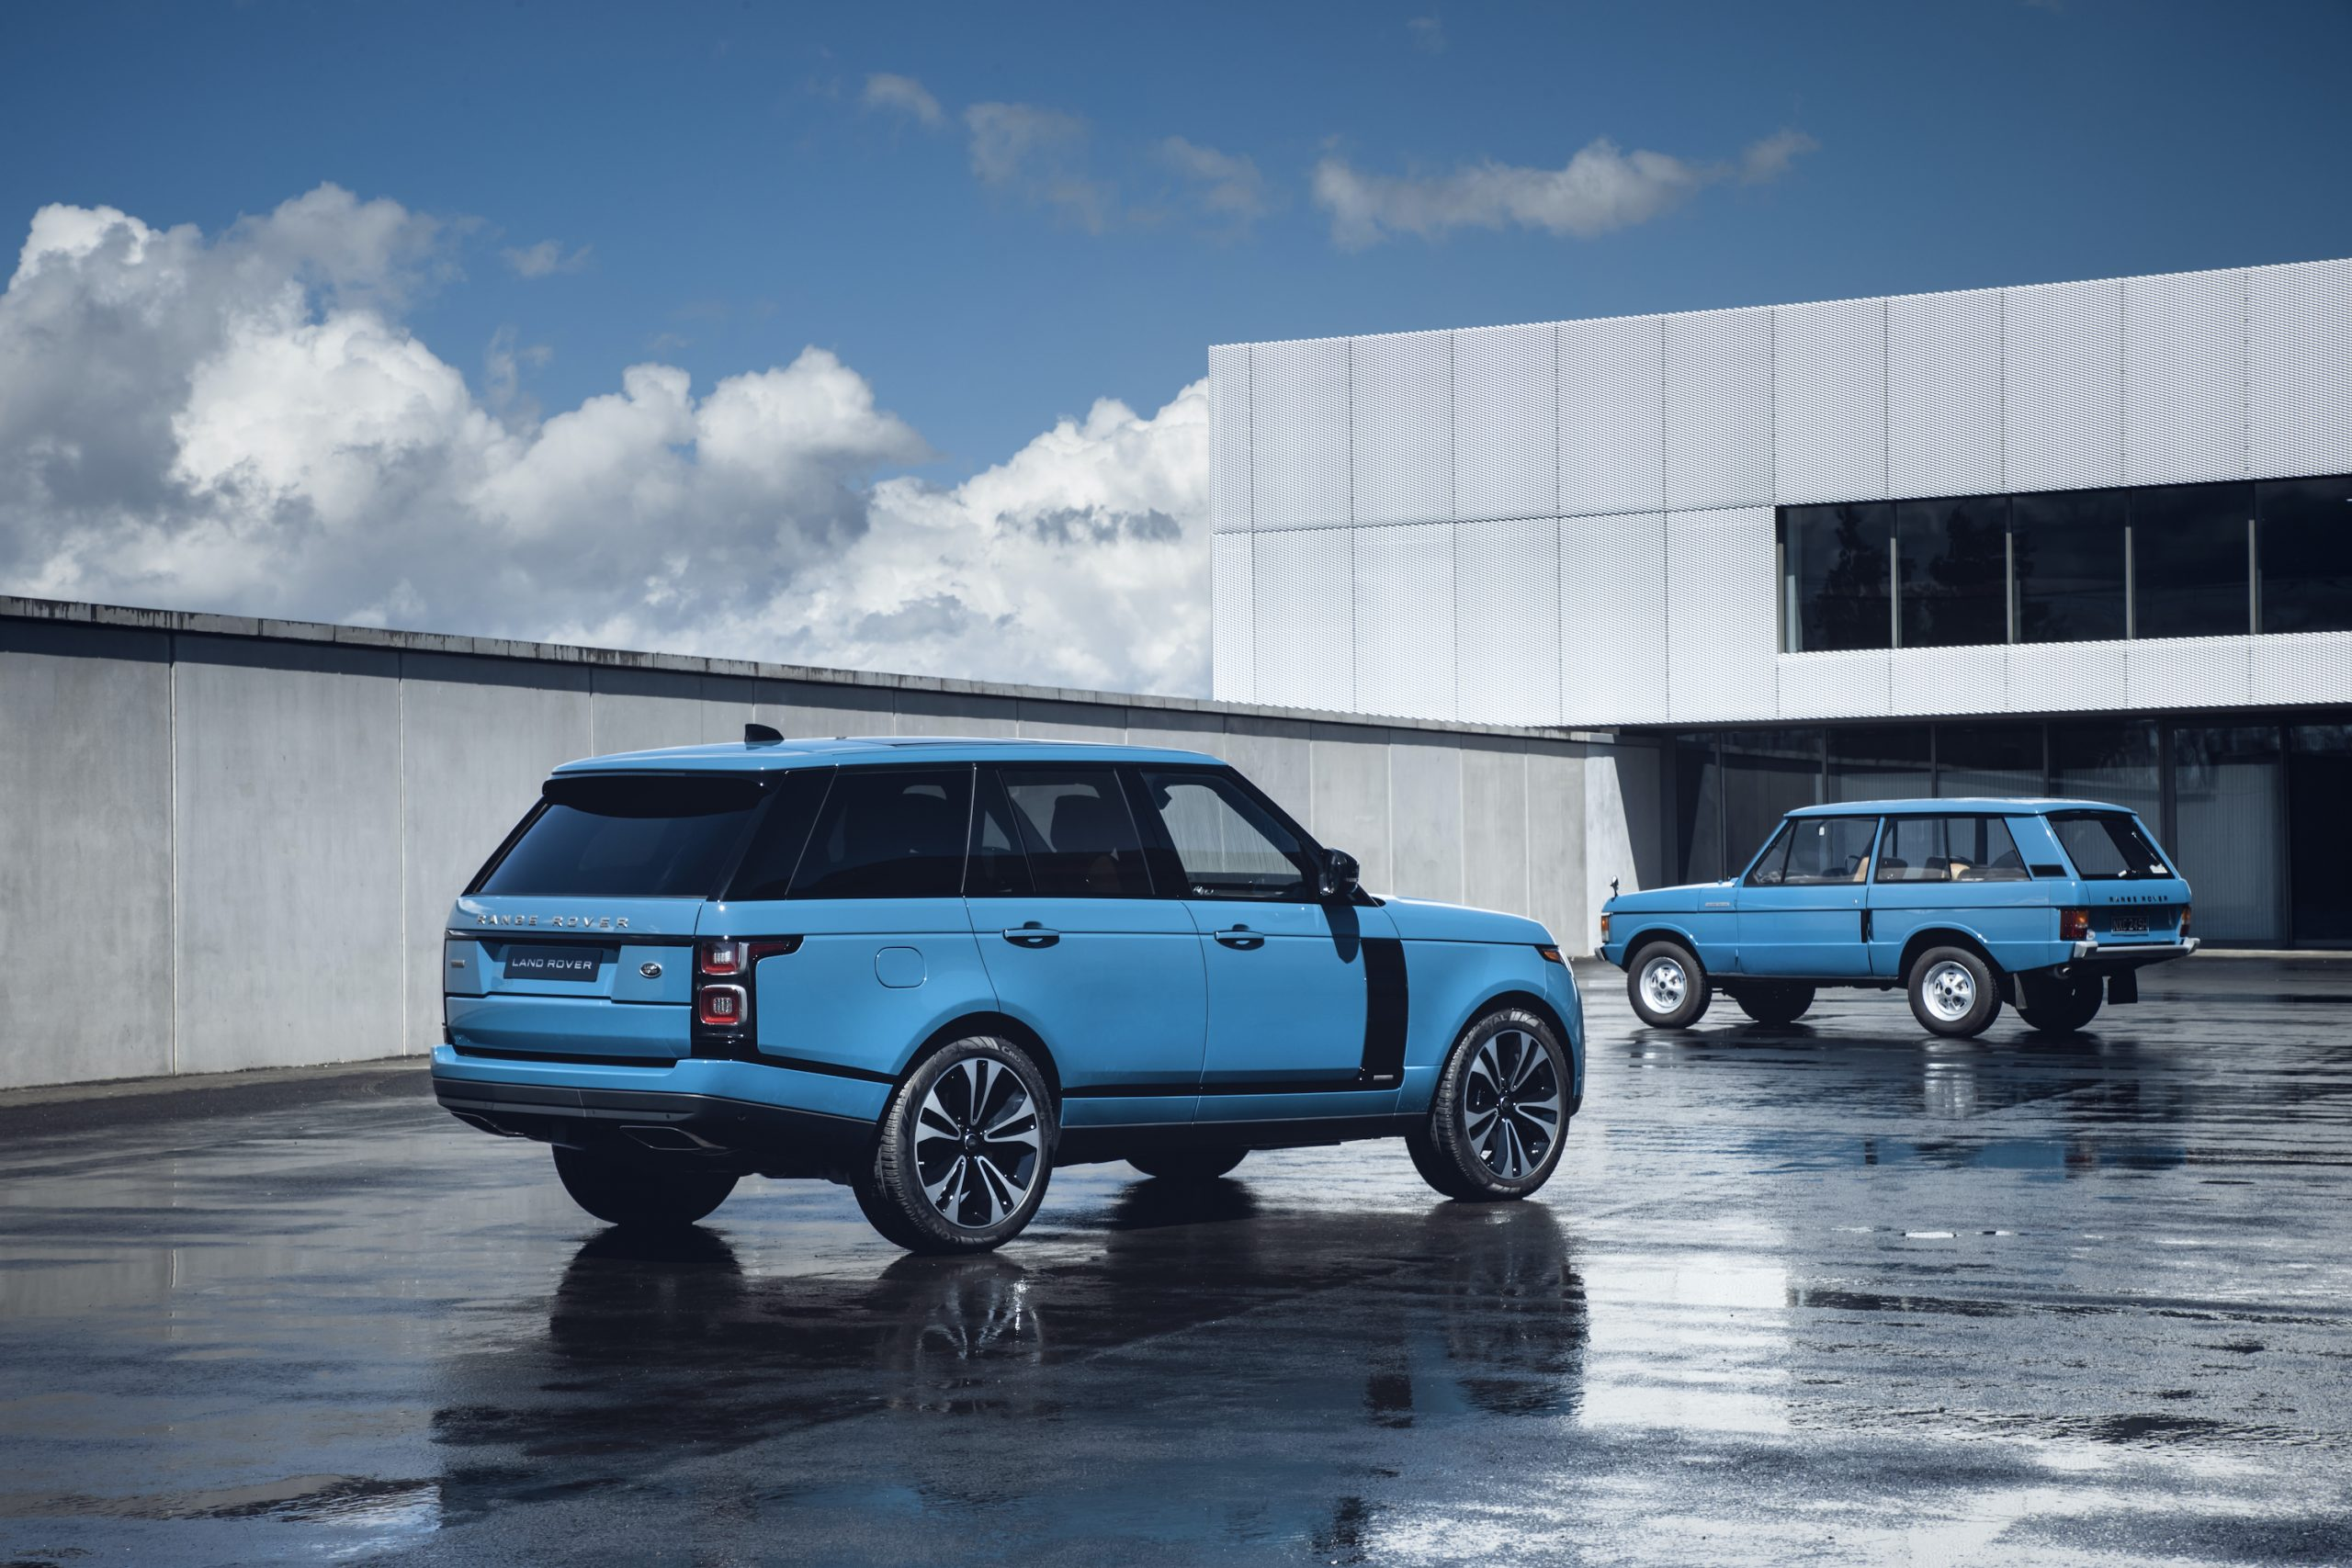 Range Rover New And Classic Rear Three-Quarter